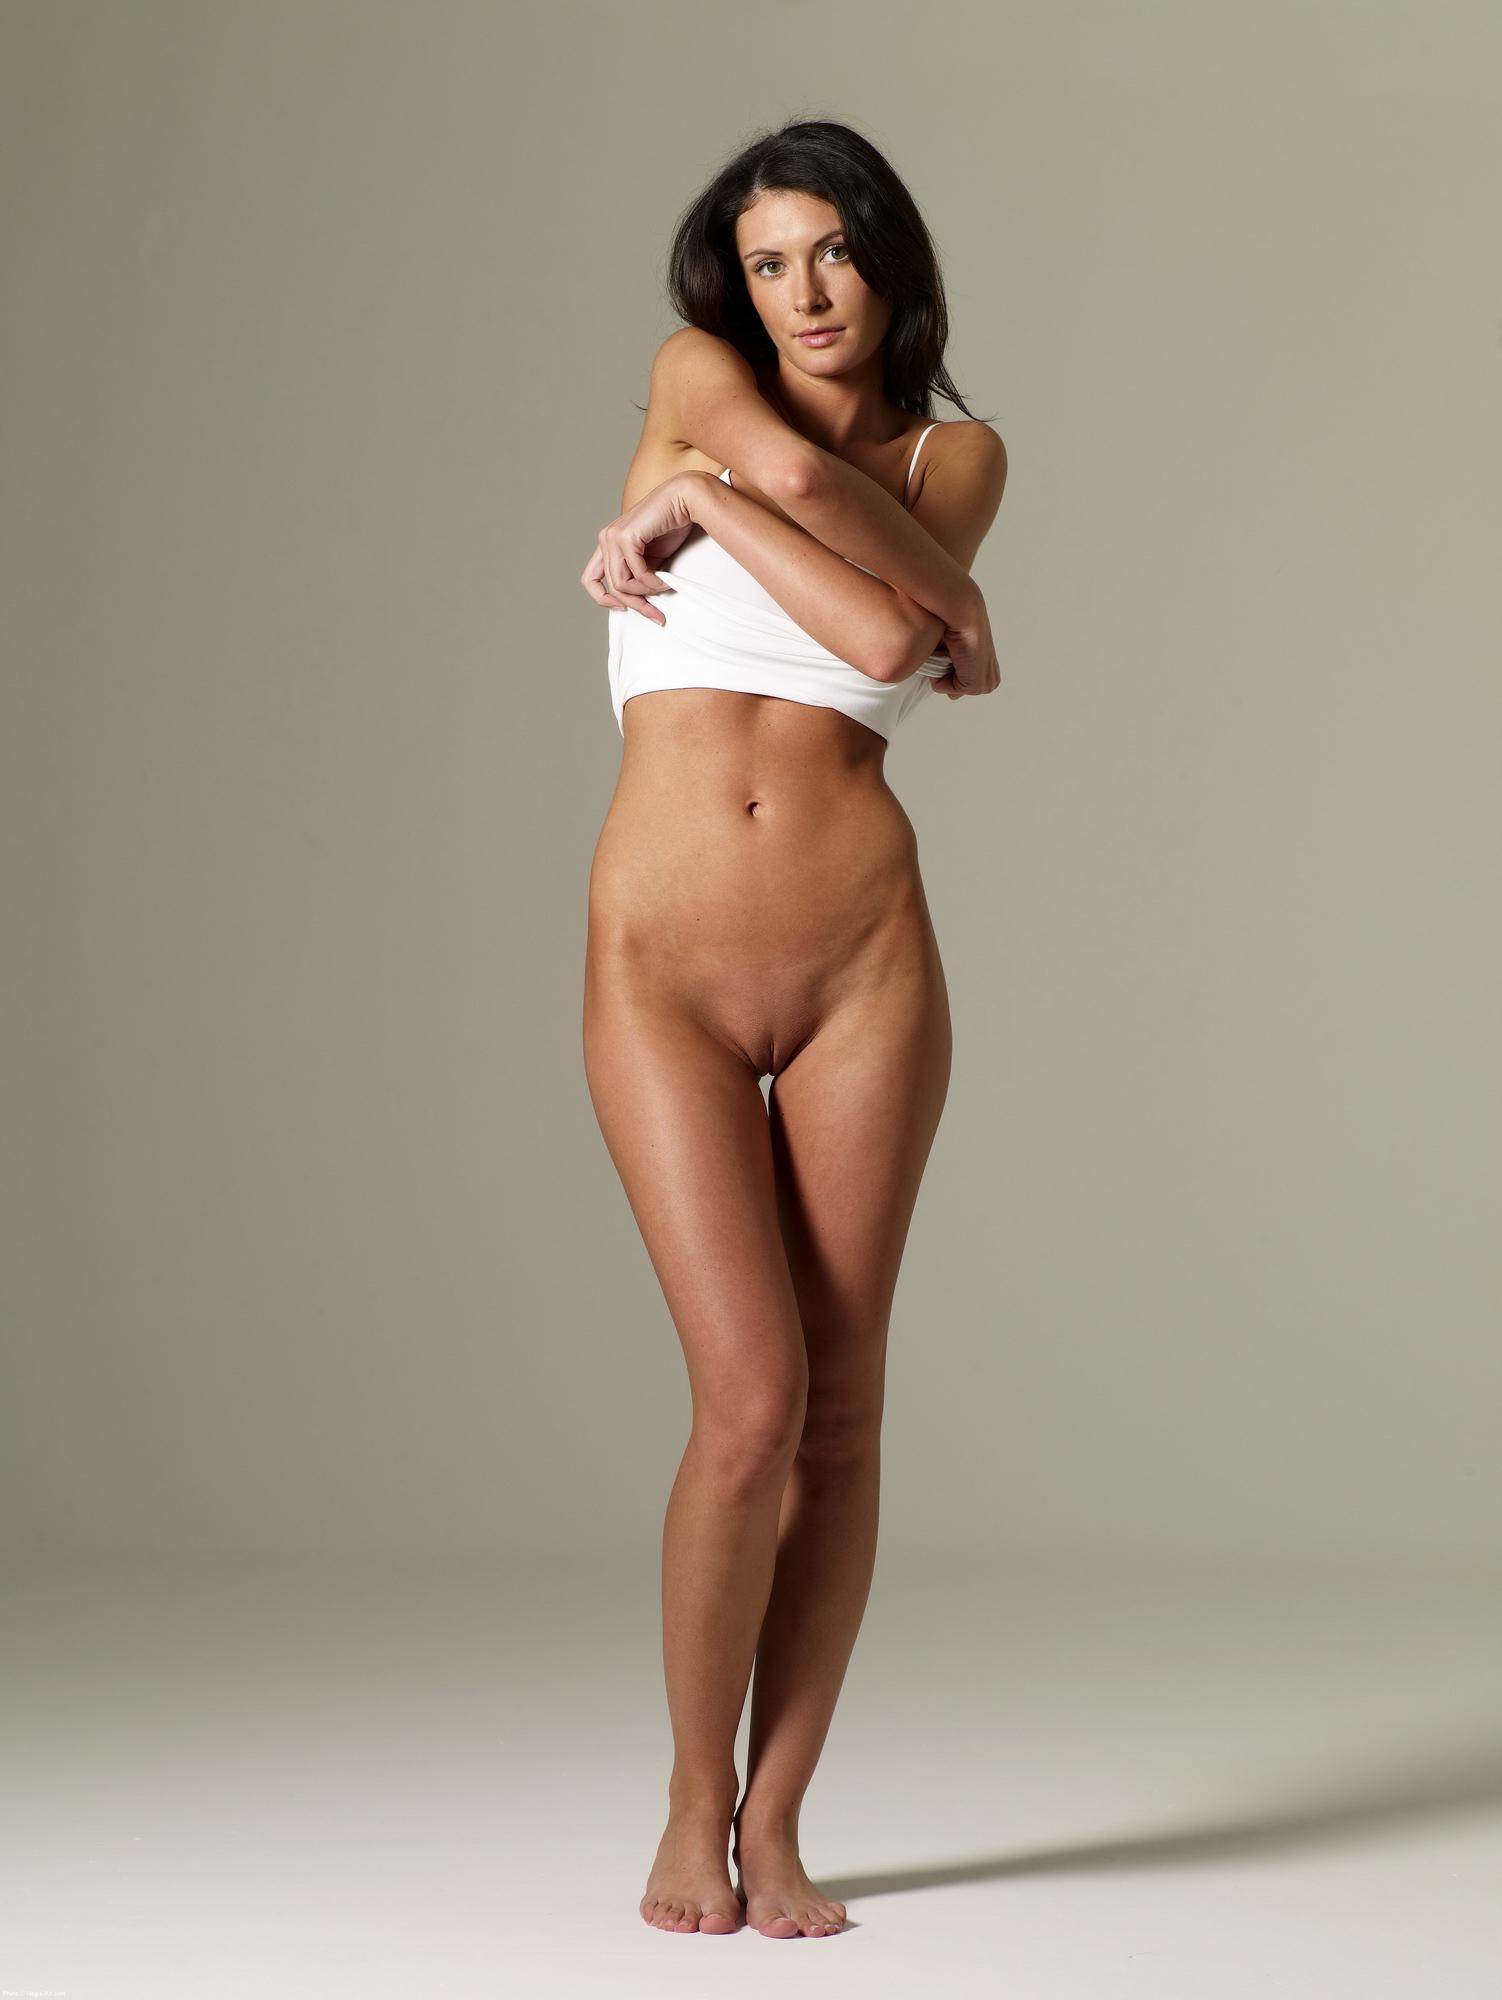 hot nude girls bottomless